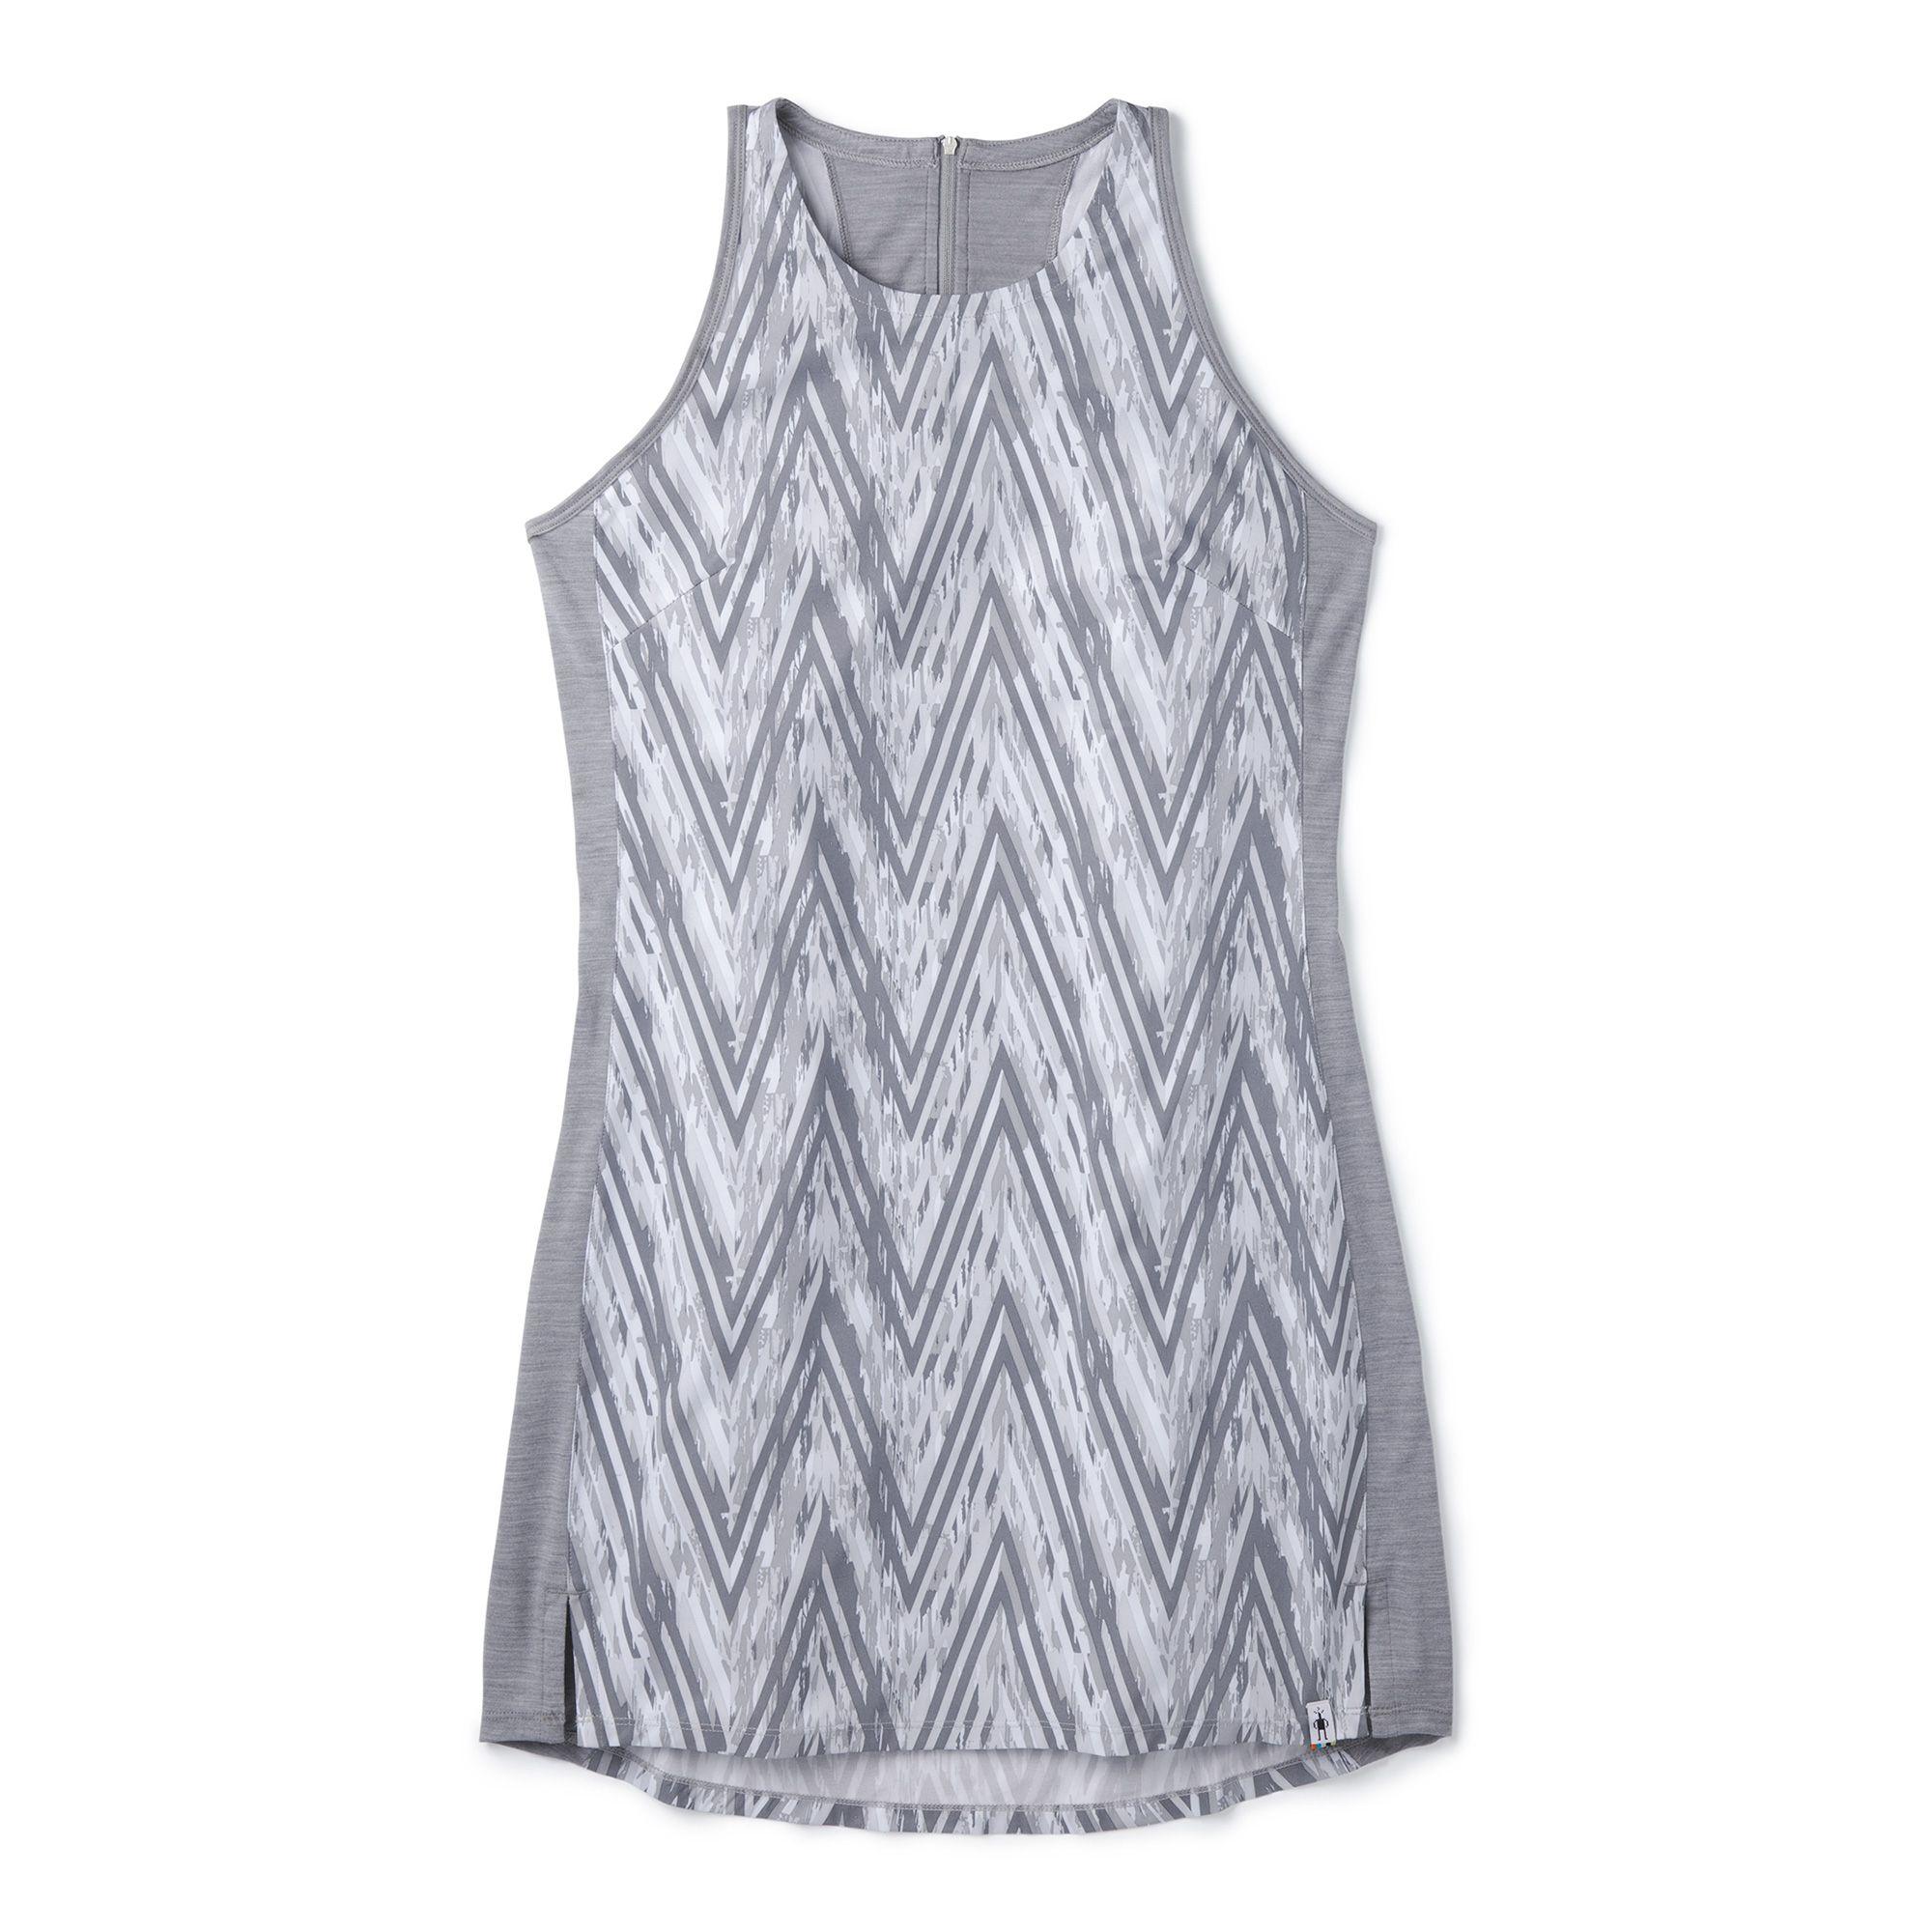 Robe camisole Merino Sport pour femmes